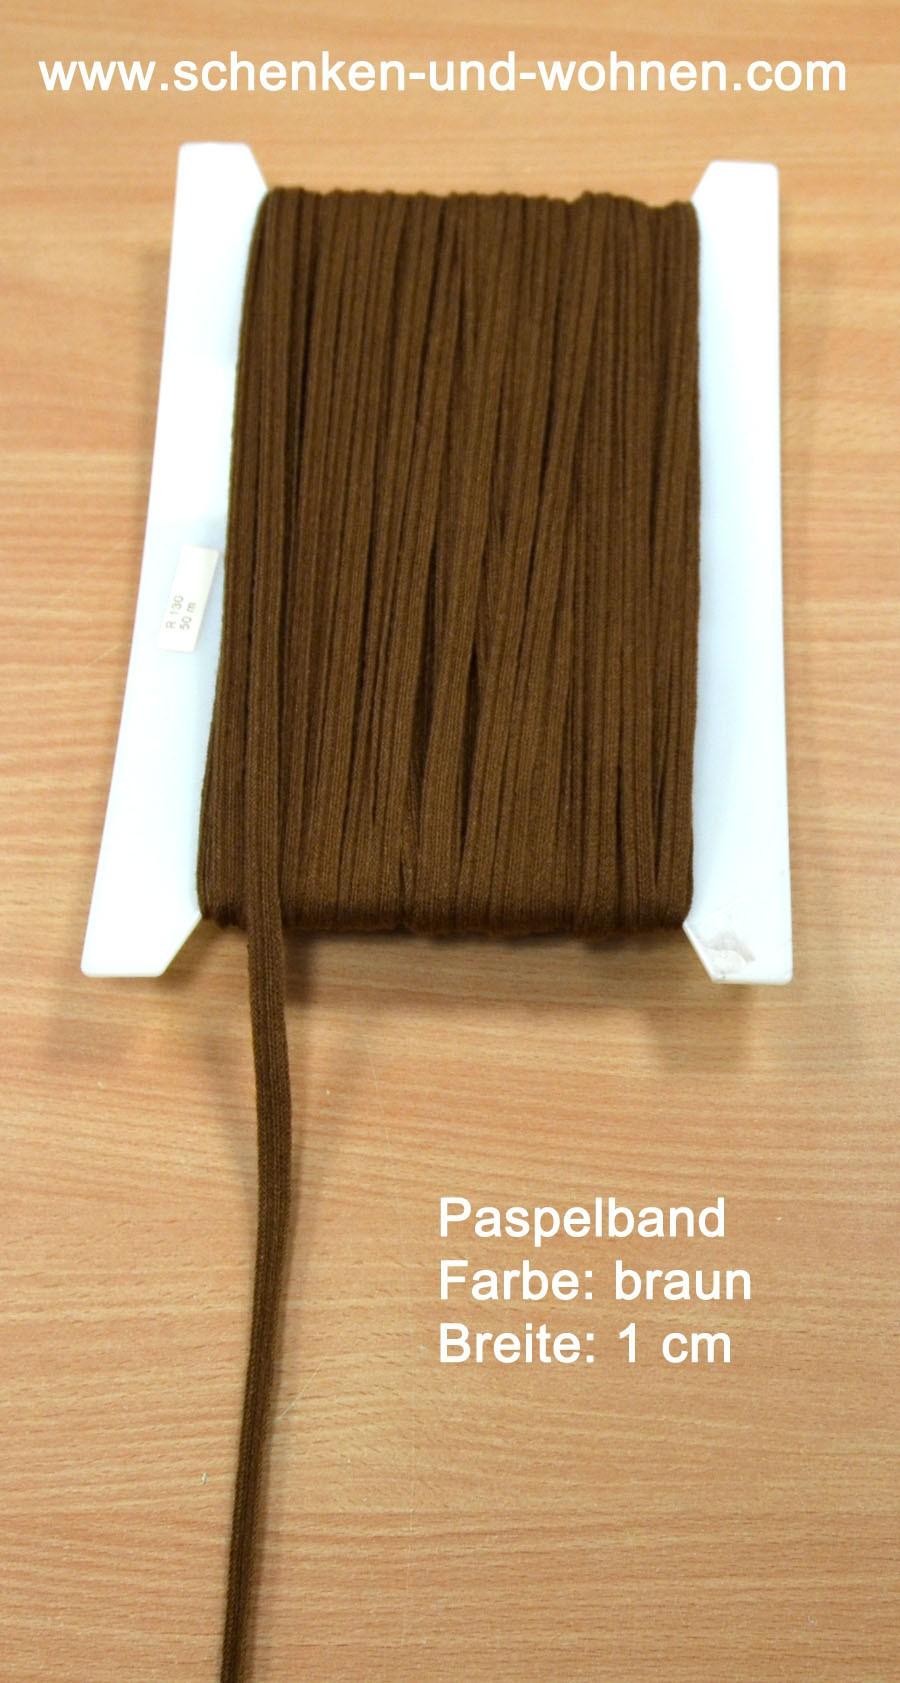 Paspel Keder Borte 1 cm breit braun Meterware